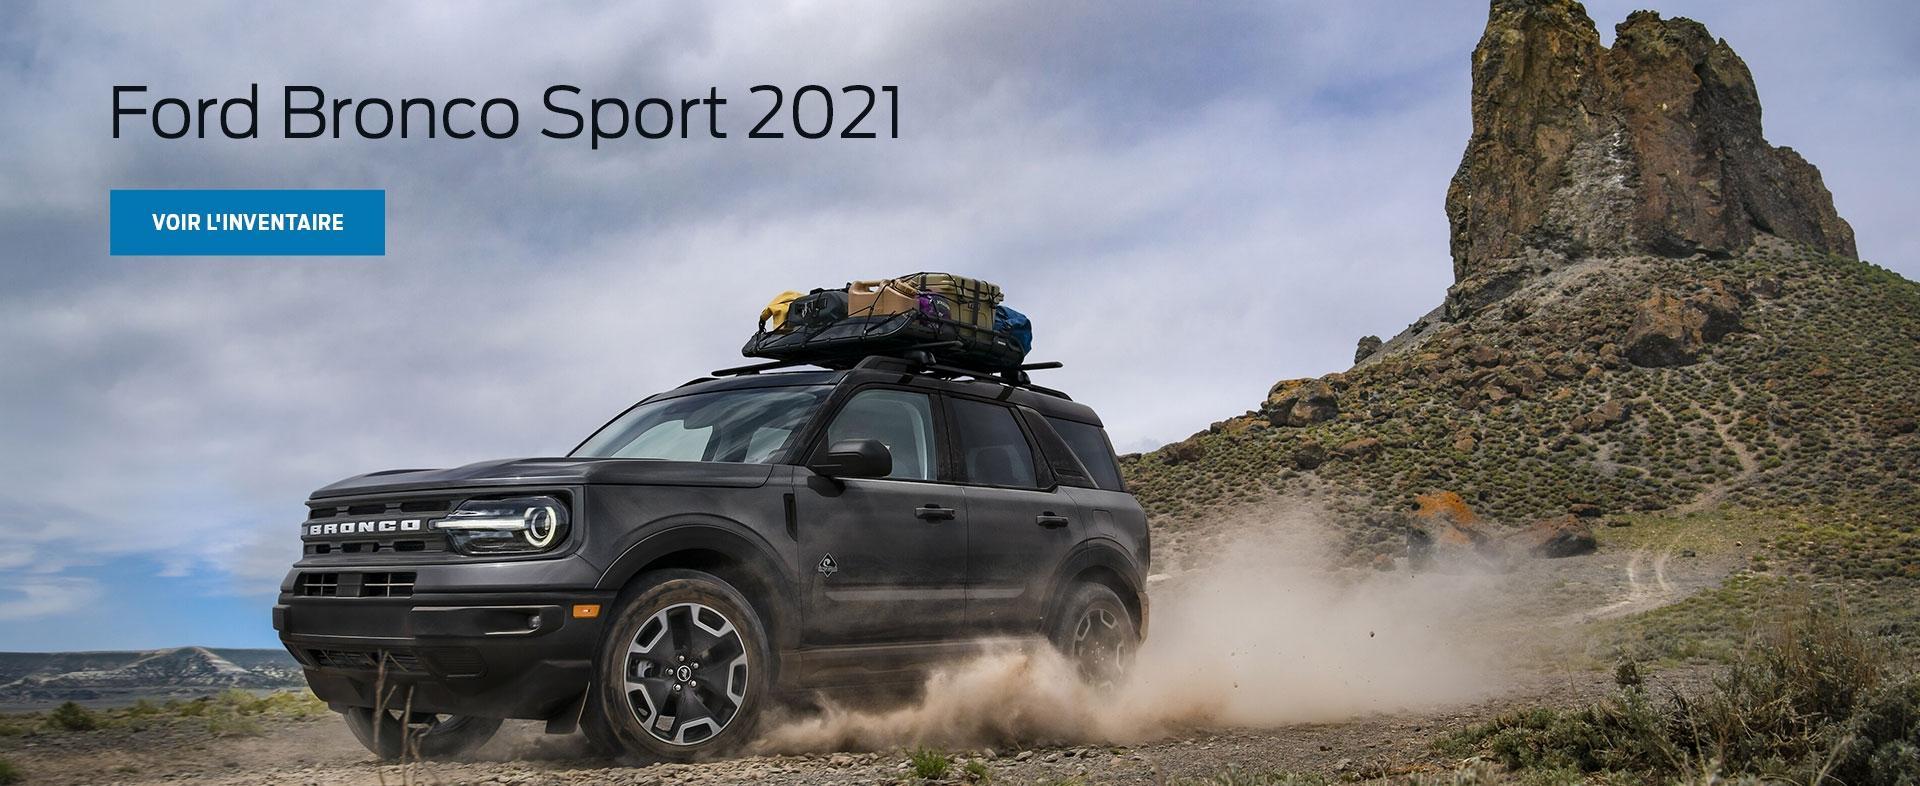 Ford Bronco Sport 2021 | Ford Lincoln Gabriel